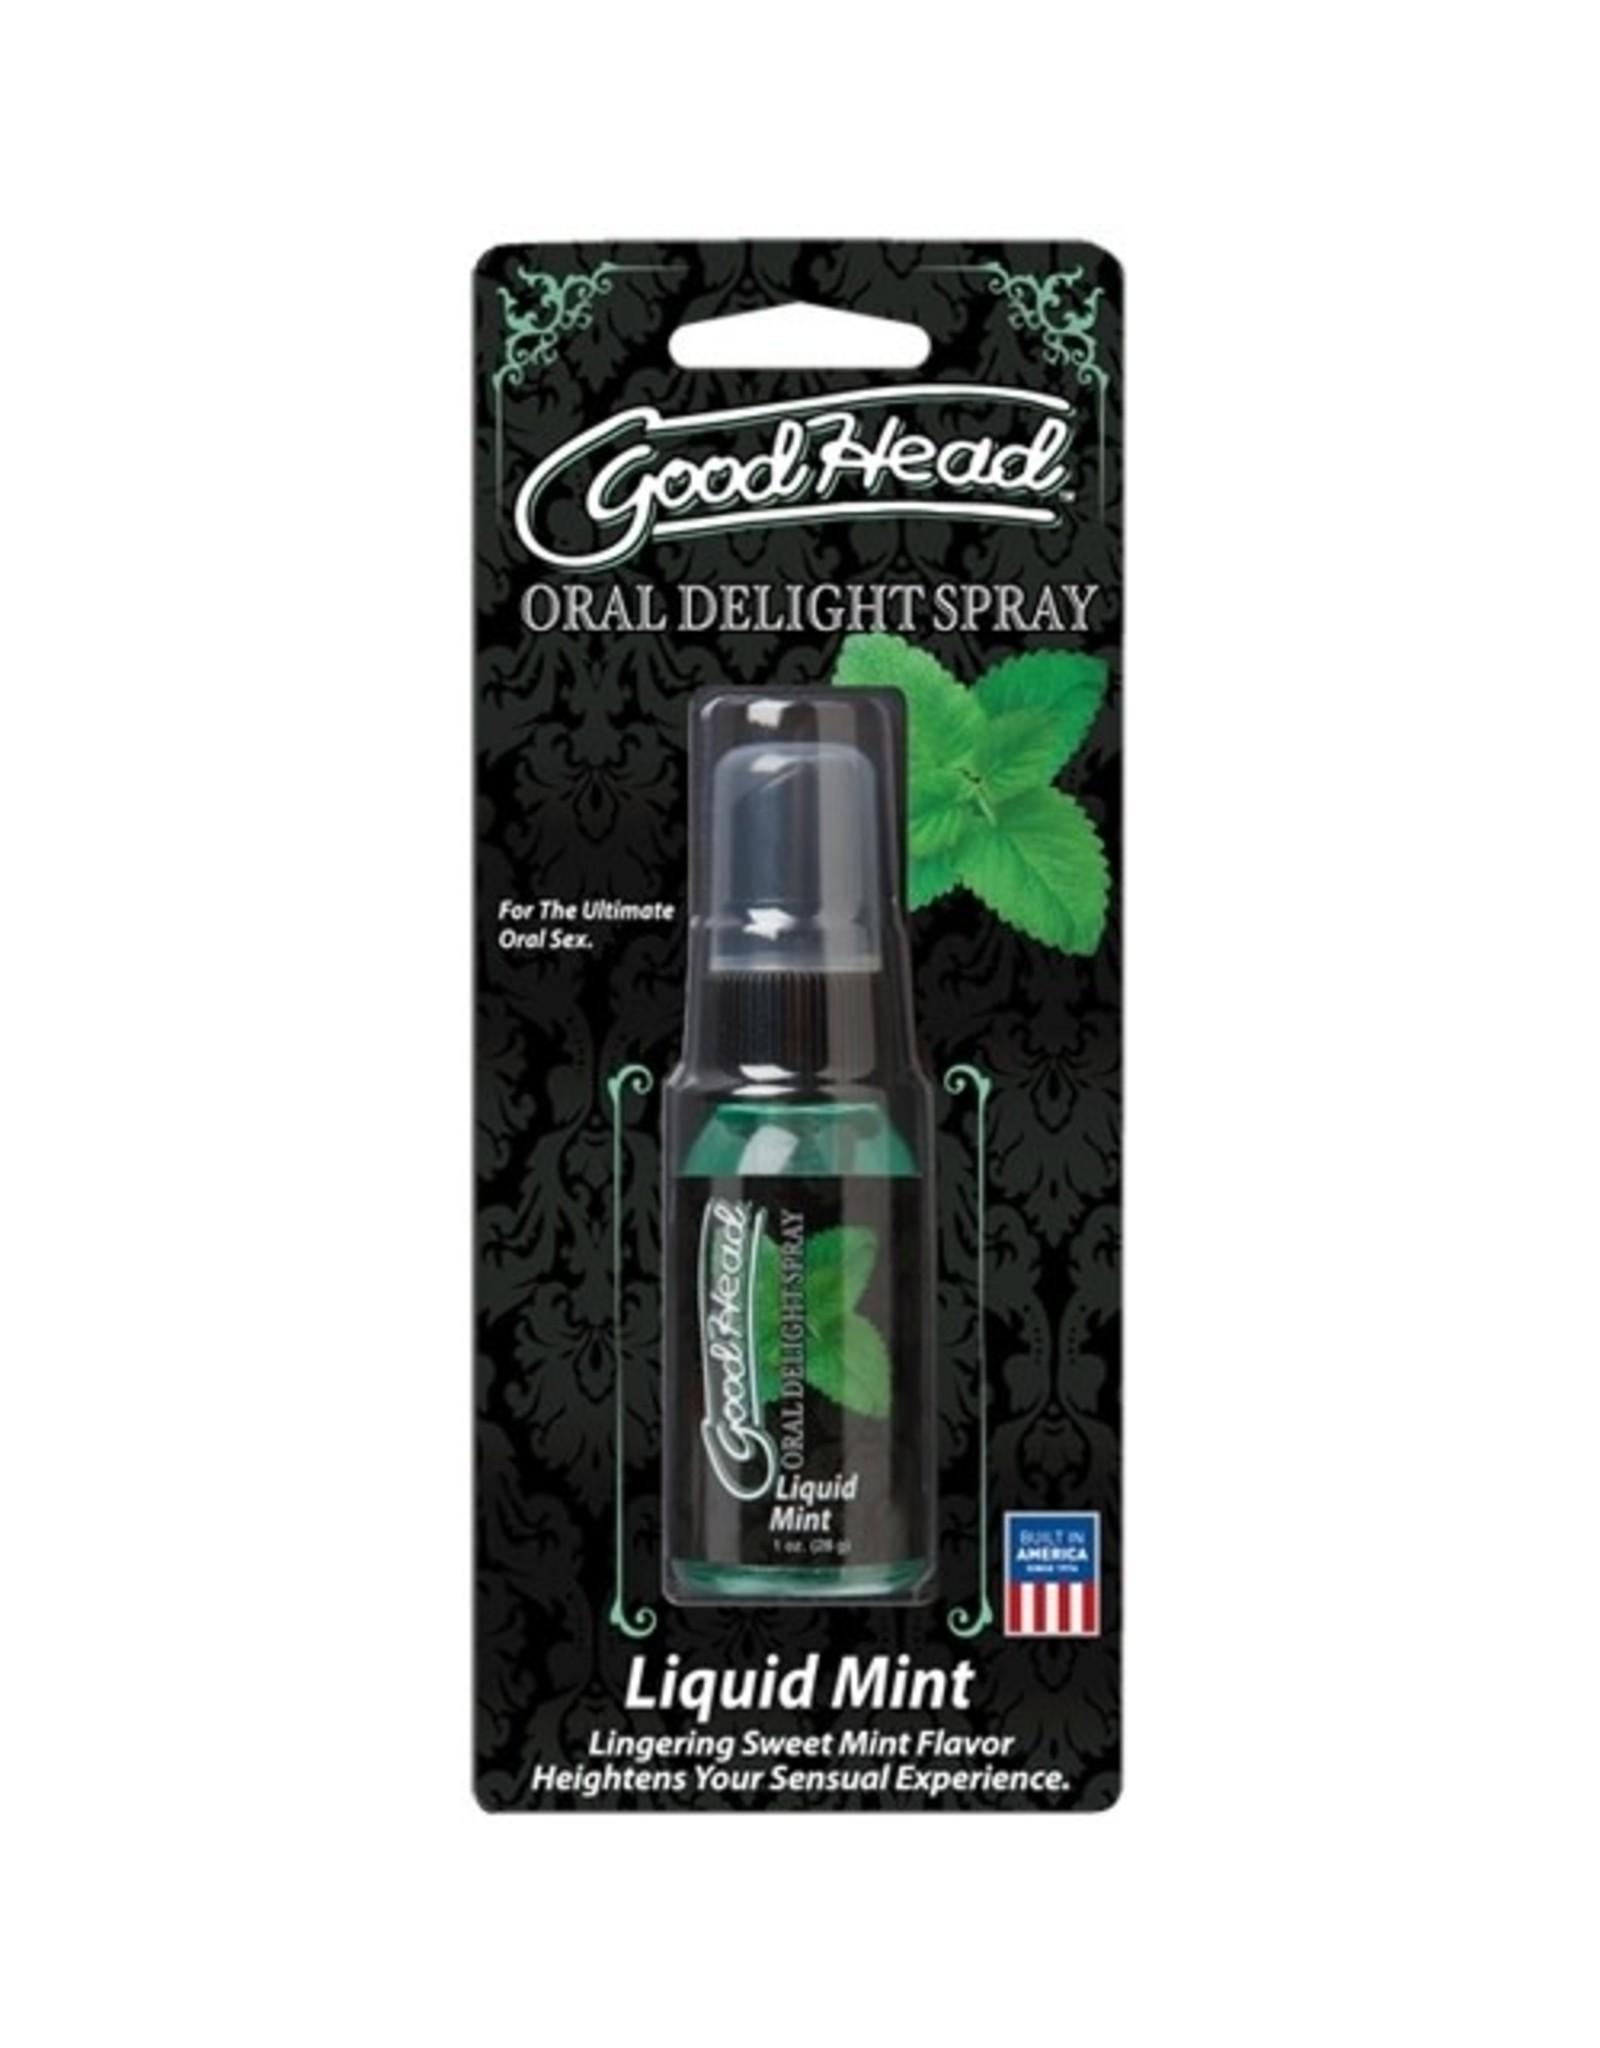 Doc Johnson Good Head - Oral Delight Spray - Liquid Mint - 1 oz